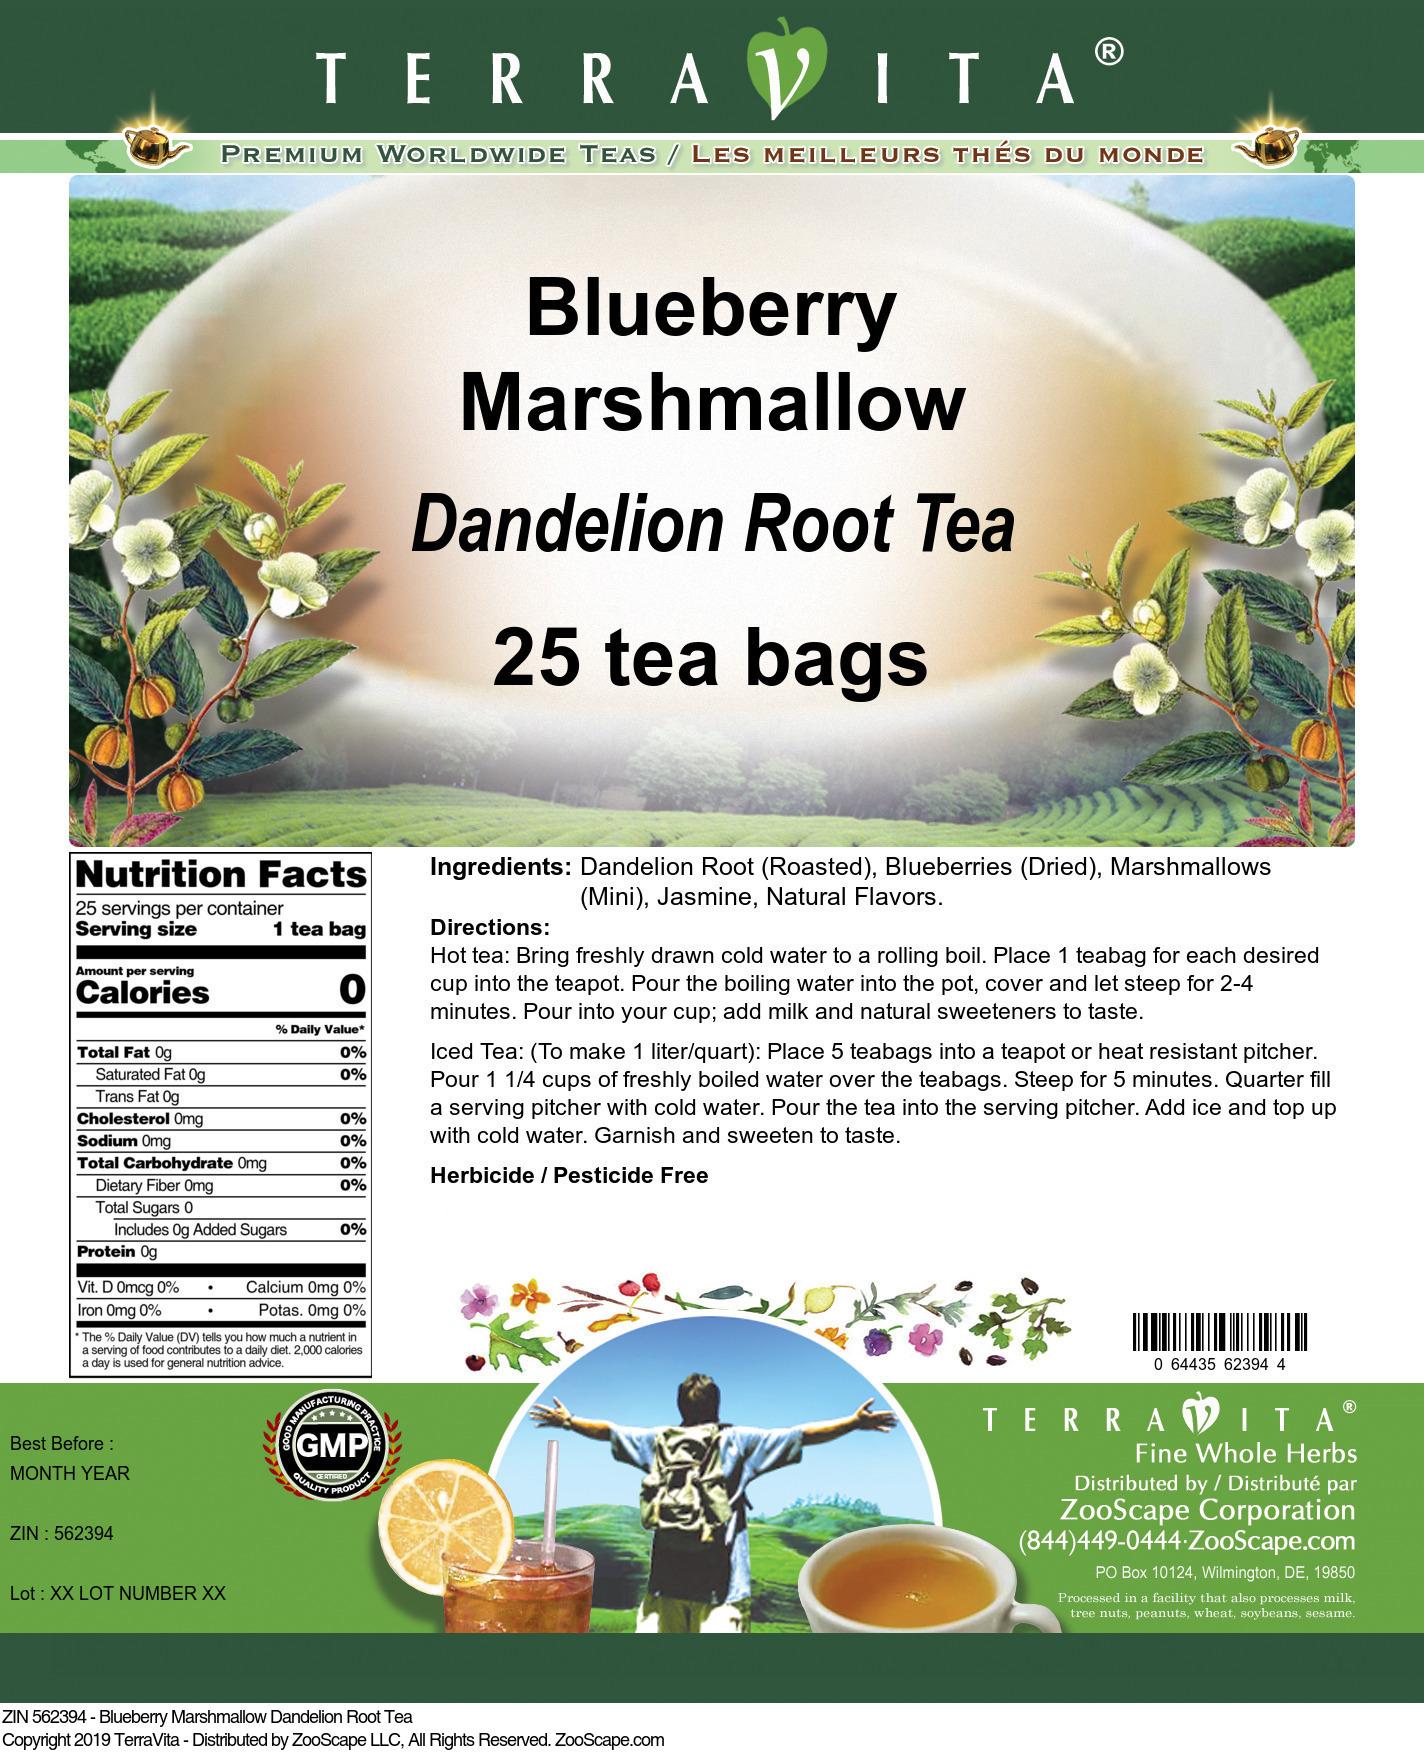 Blueberry Marshmallow Dandelion Root